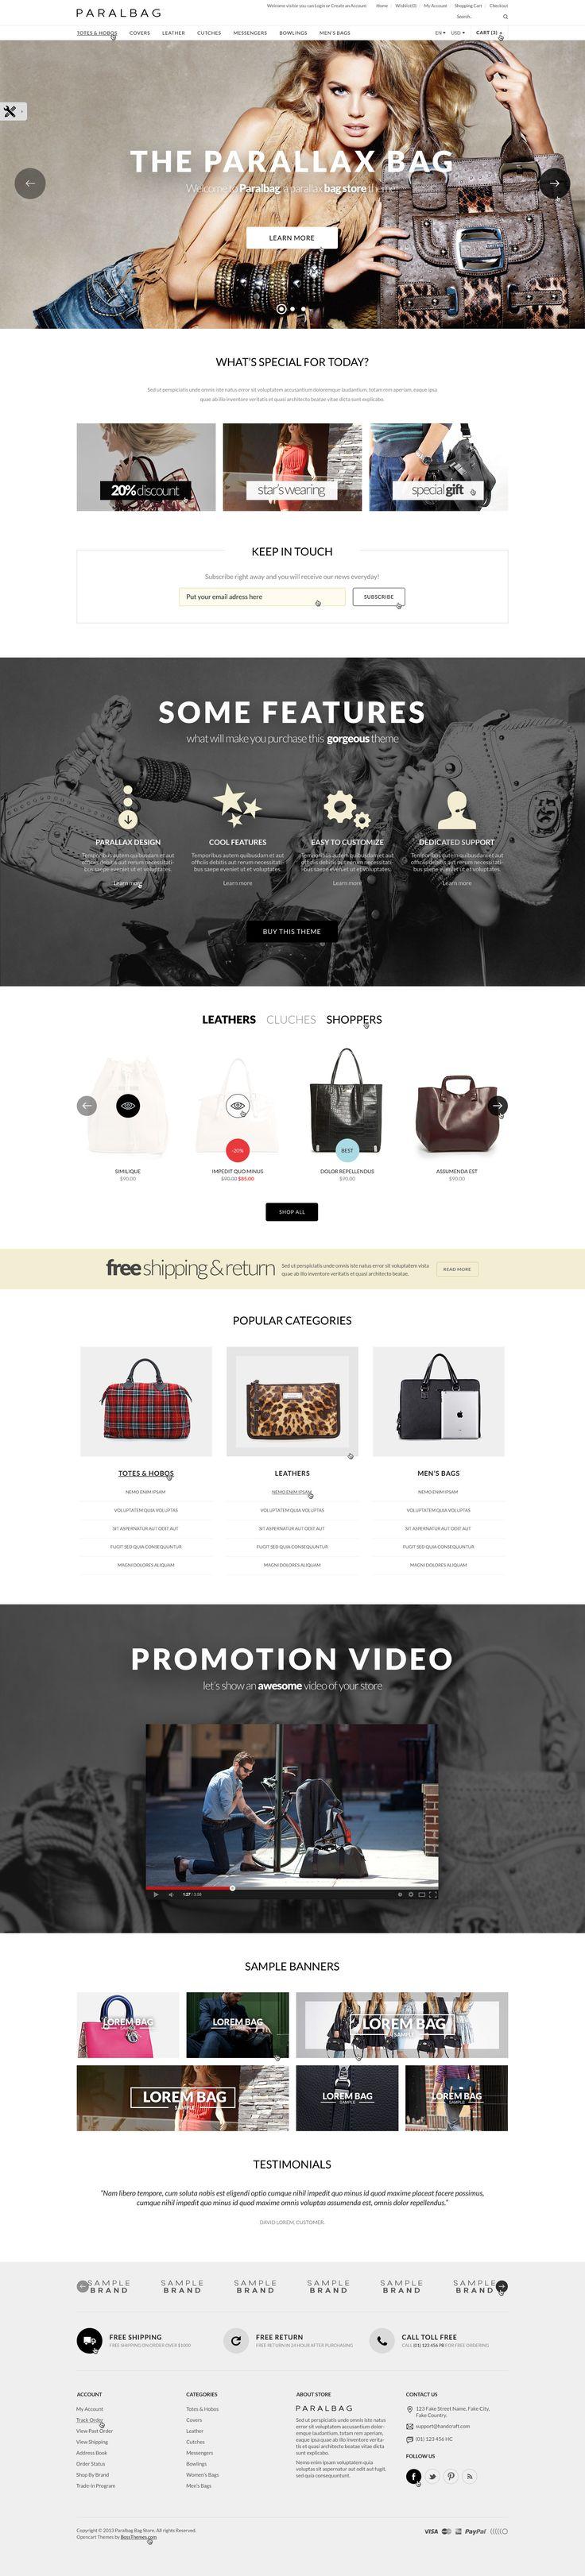 Opencart Fashion Bag Store – Parallax